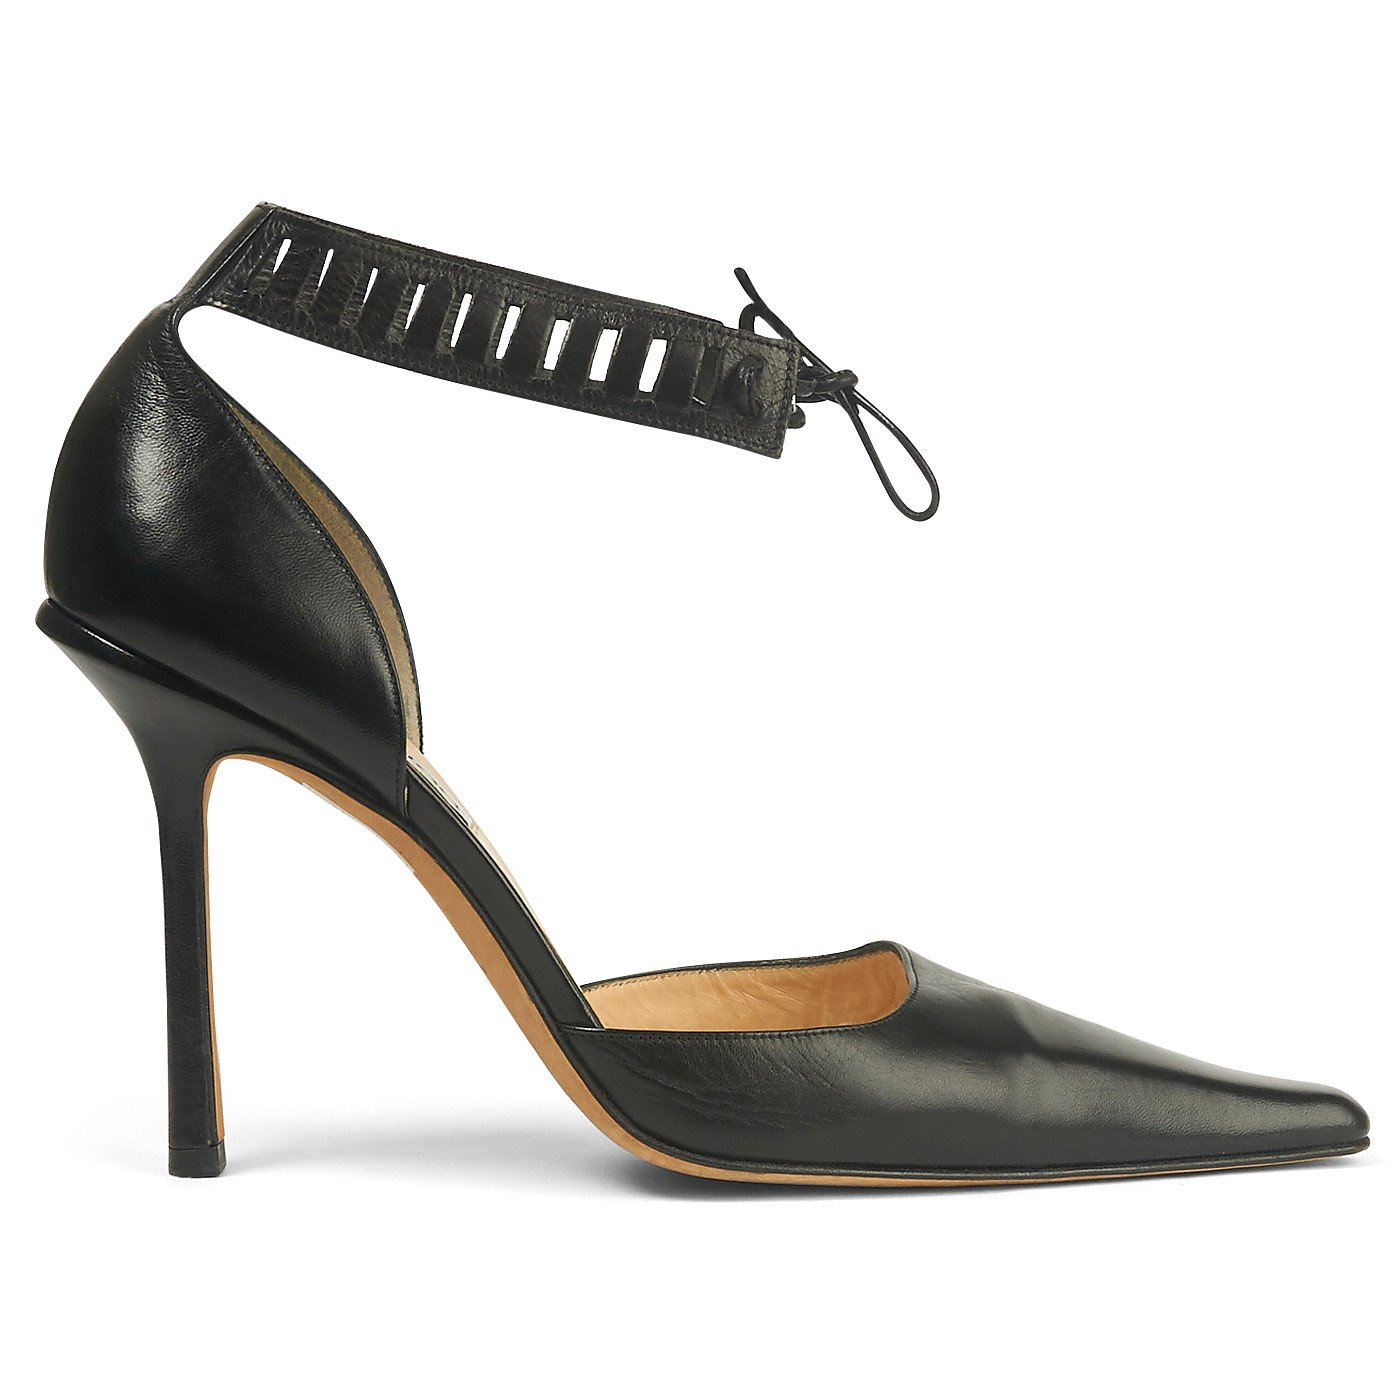 Jimmy Choo Ankle Strap Stiletto